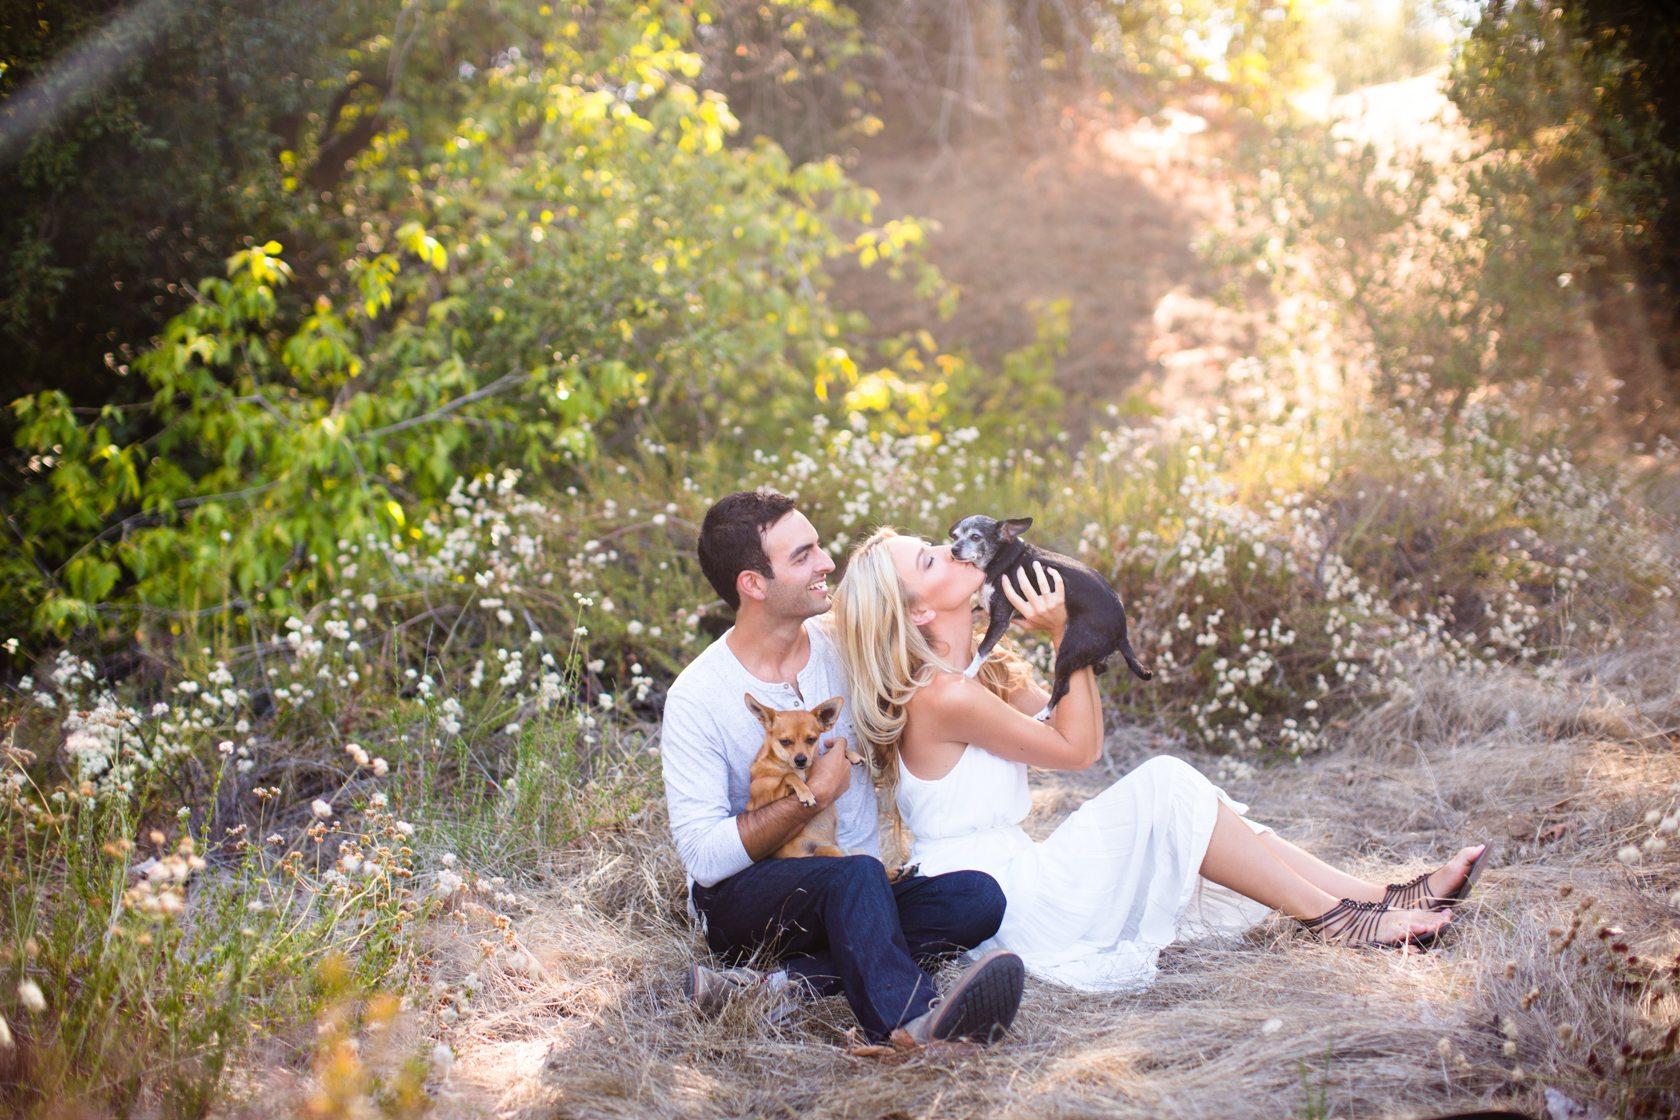 Highland_Springs_Lavender_Field_Engagement_23.jpg